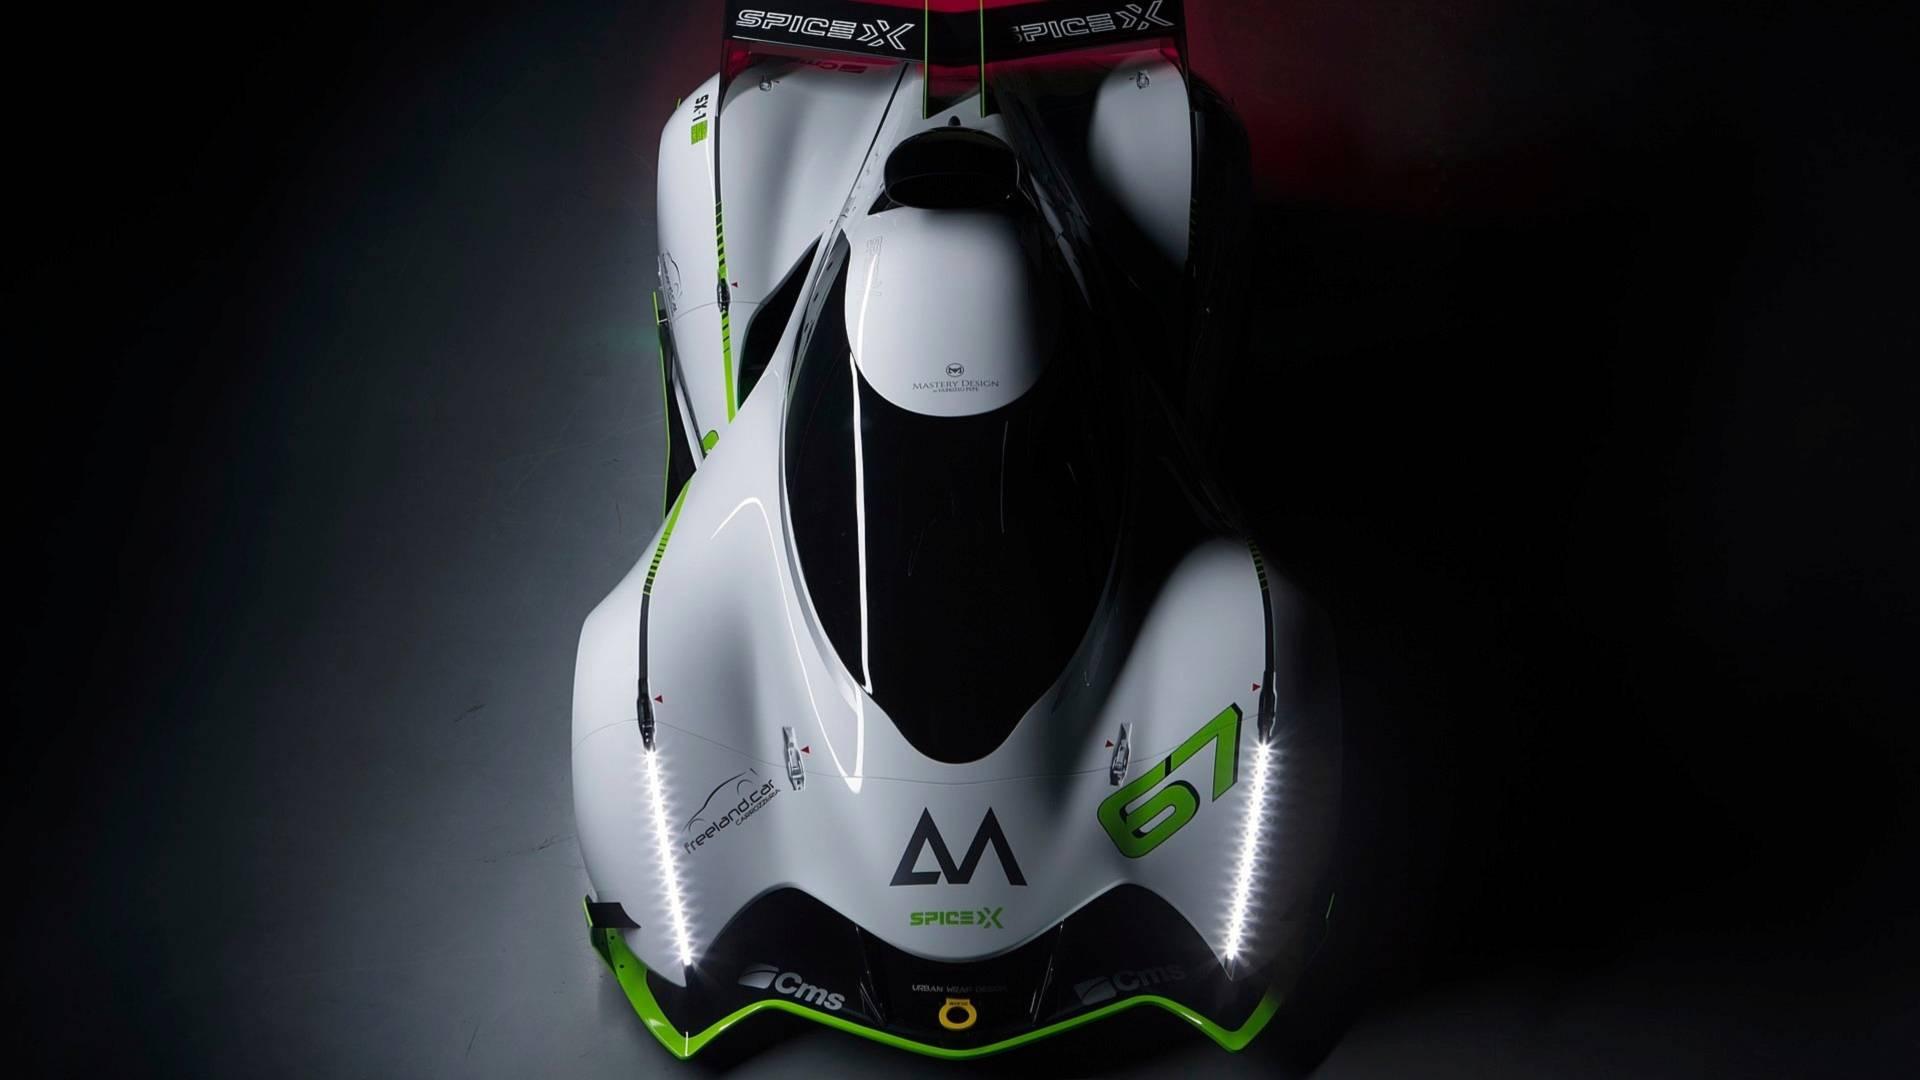 Spice-X SX1— гоночный электрокар «для всех»